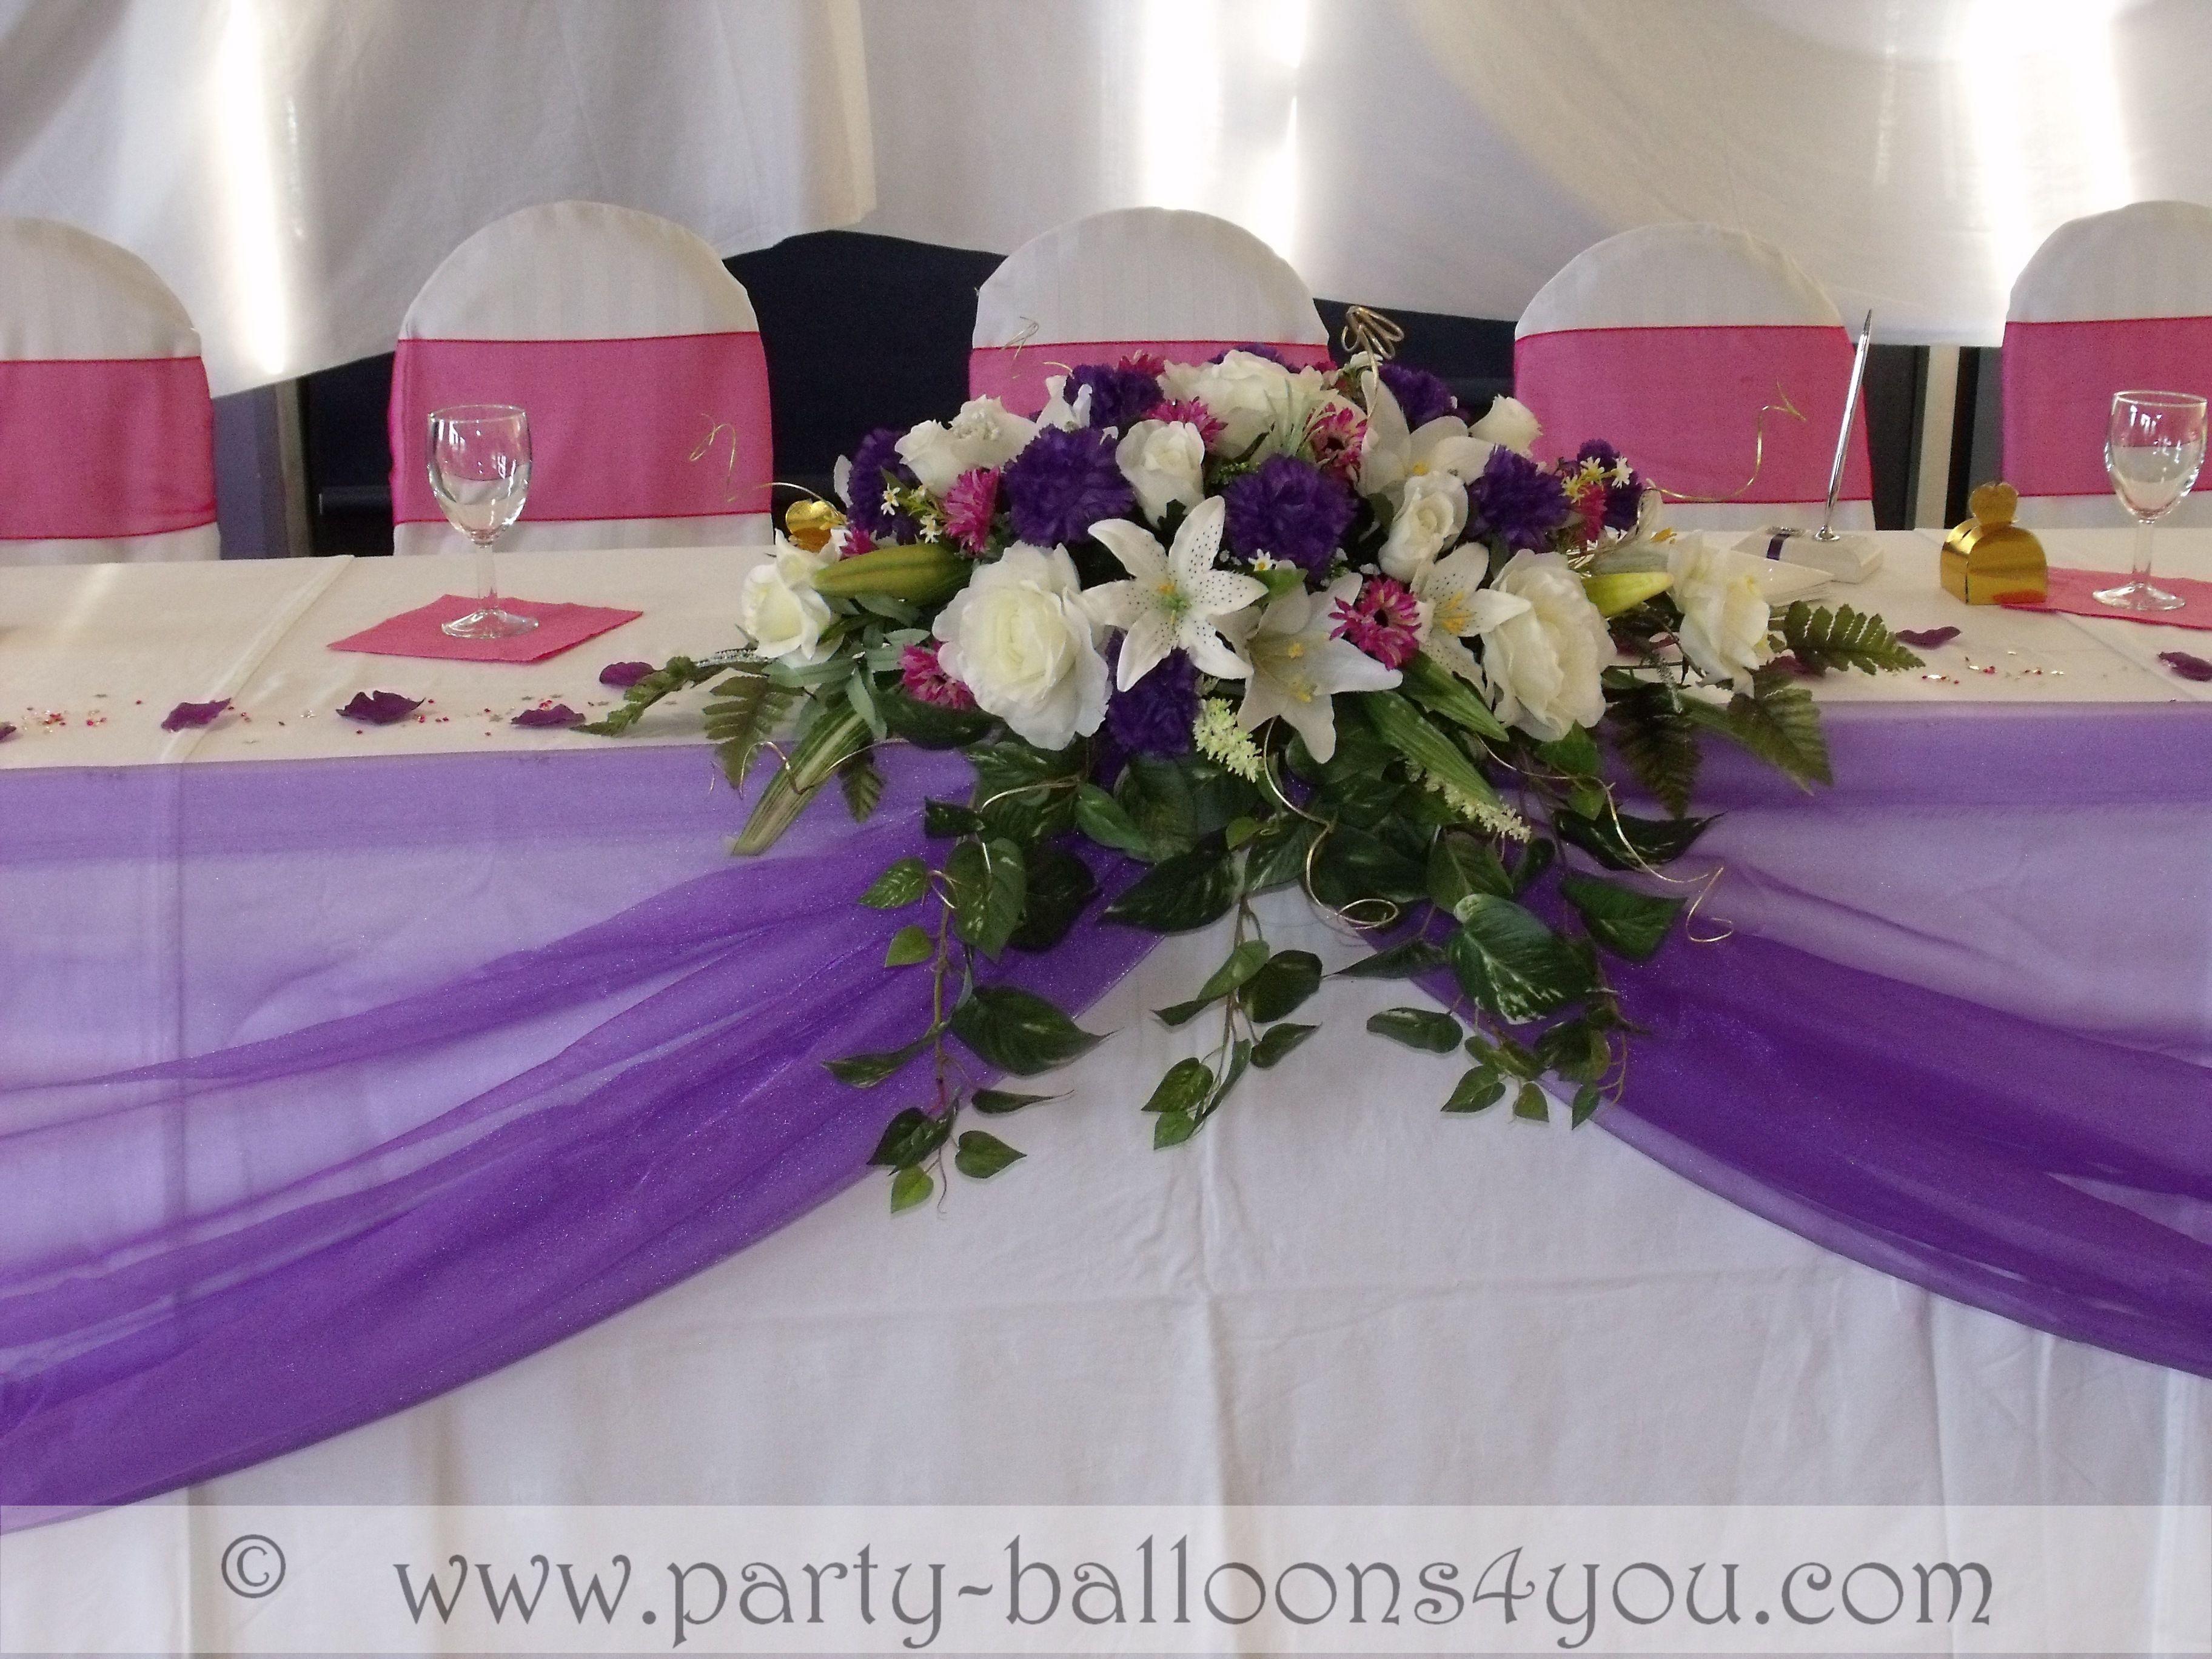 wedding table centerpieces Wedding Venue Decorations Done at Goals Soccer Centre Brislington Bristol